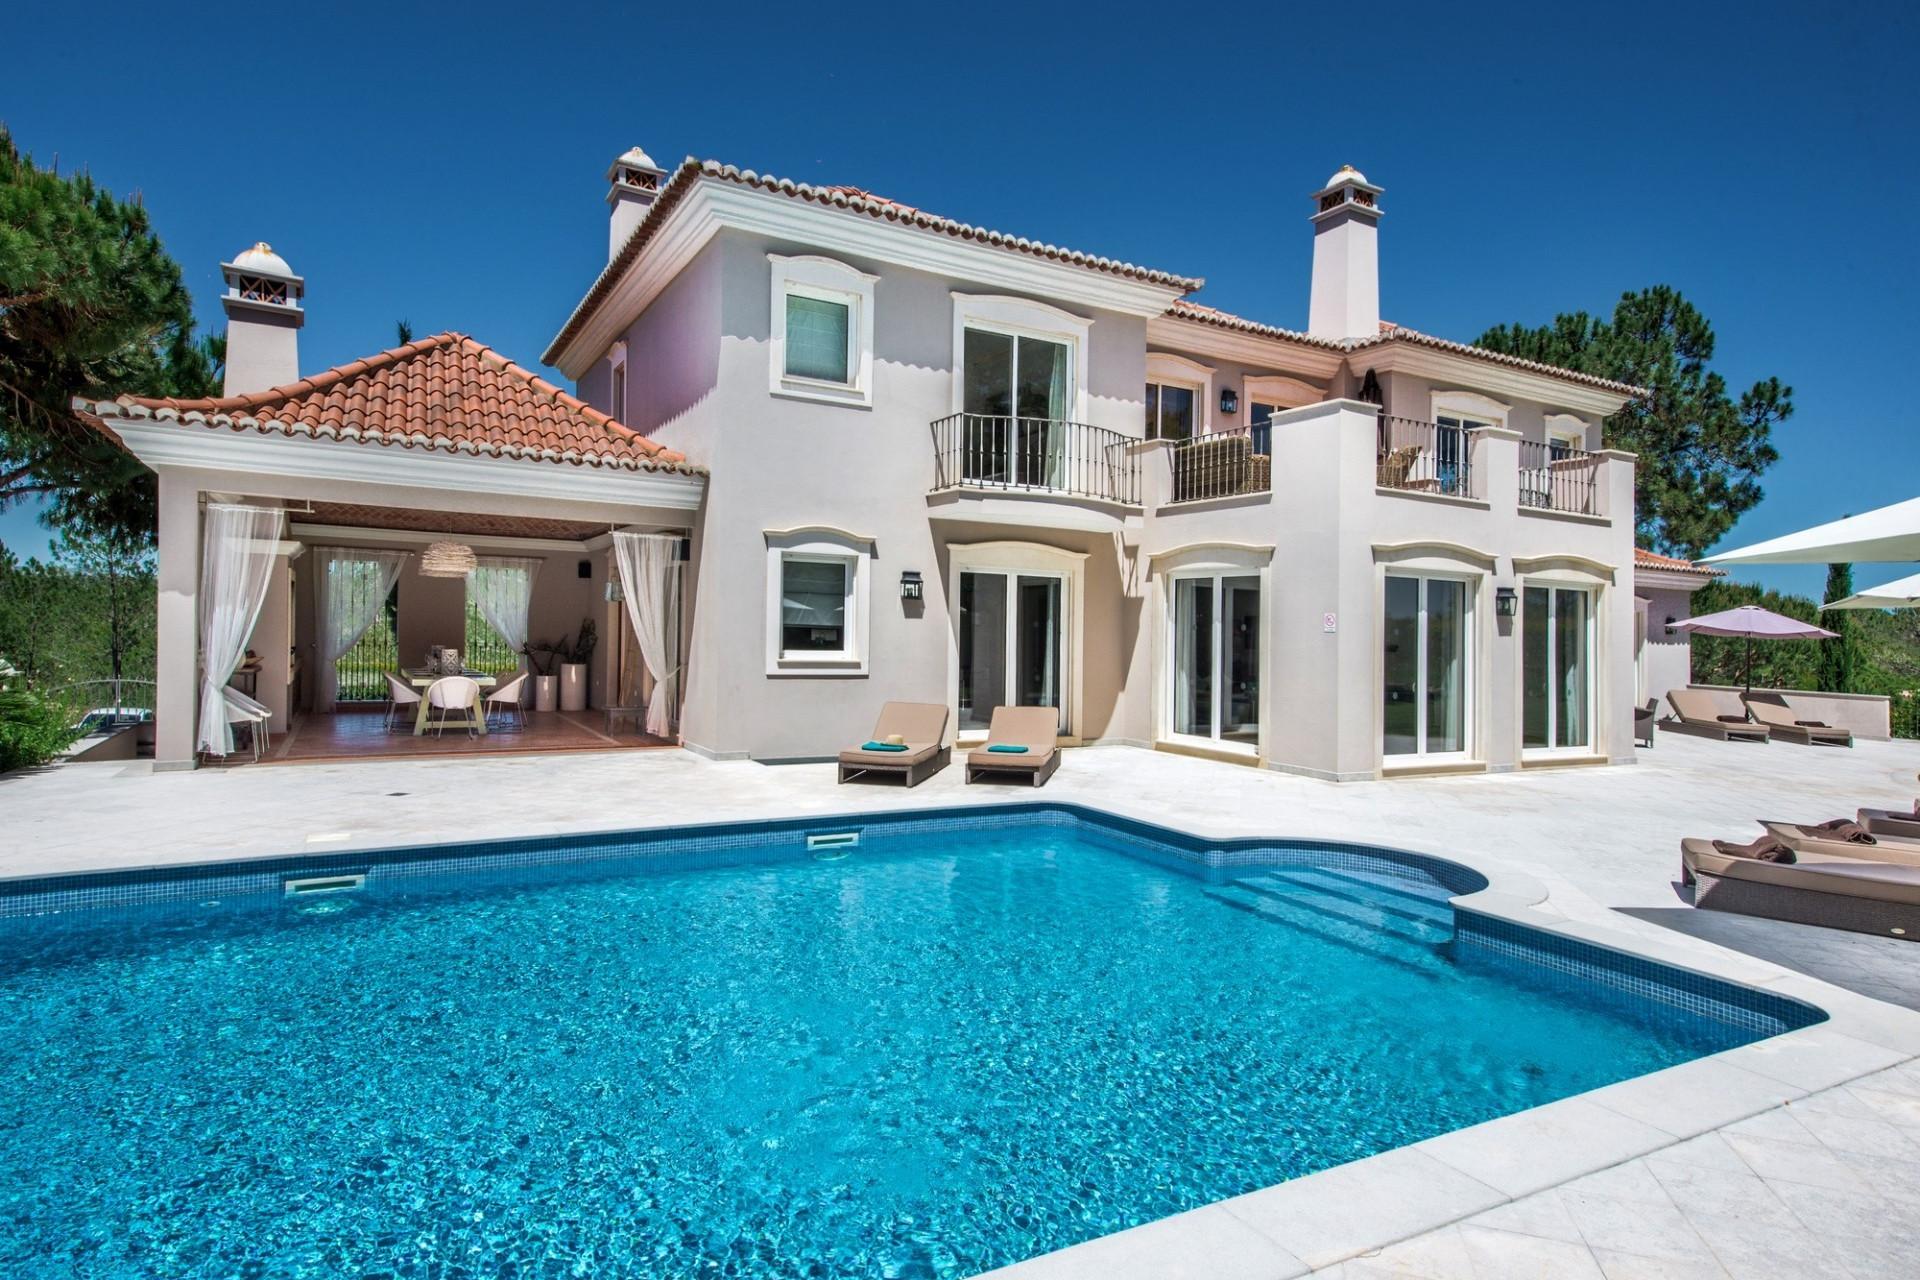 5 Bedroom Villa Quinta do Lago Pool & Walking Distance To Amenities